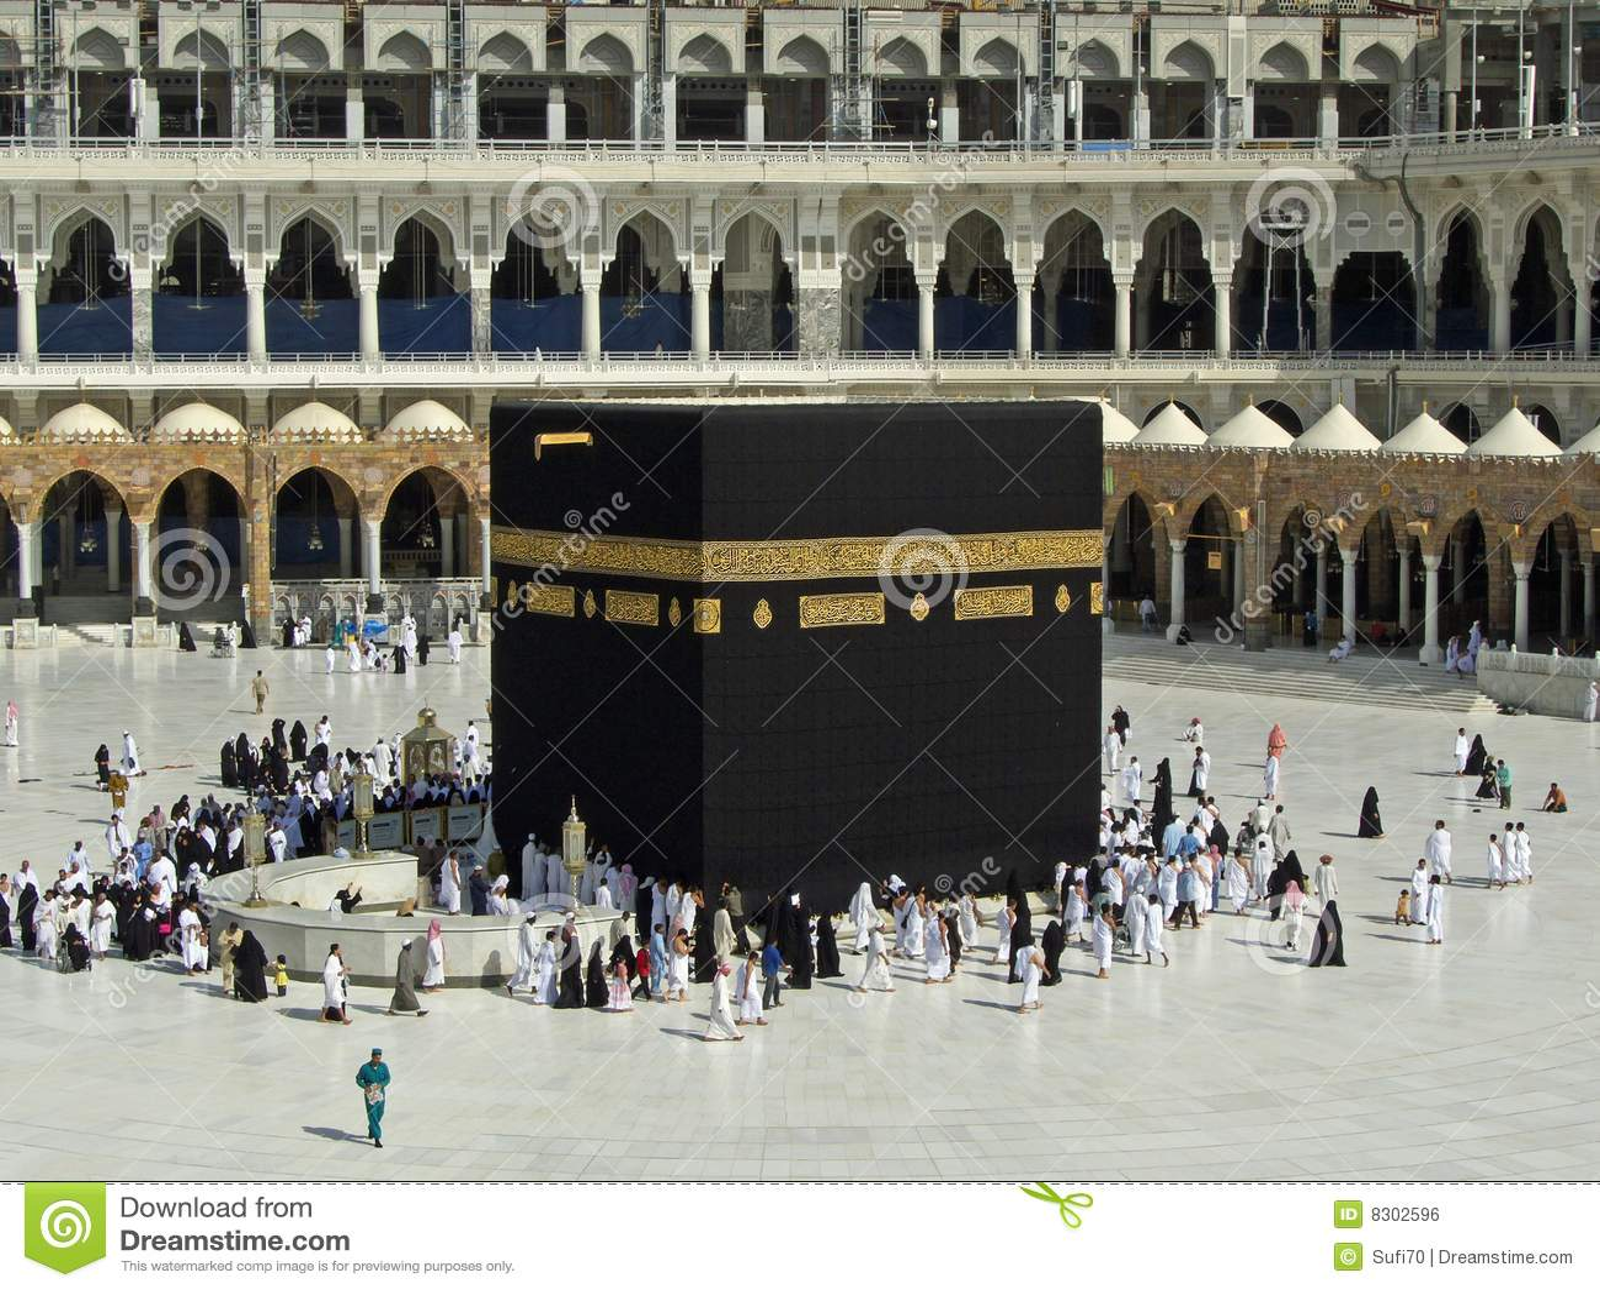 La mecque de kaaba photo ditorial image 8302596 for Interieur de la kaaba